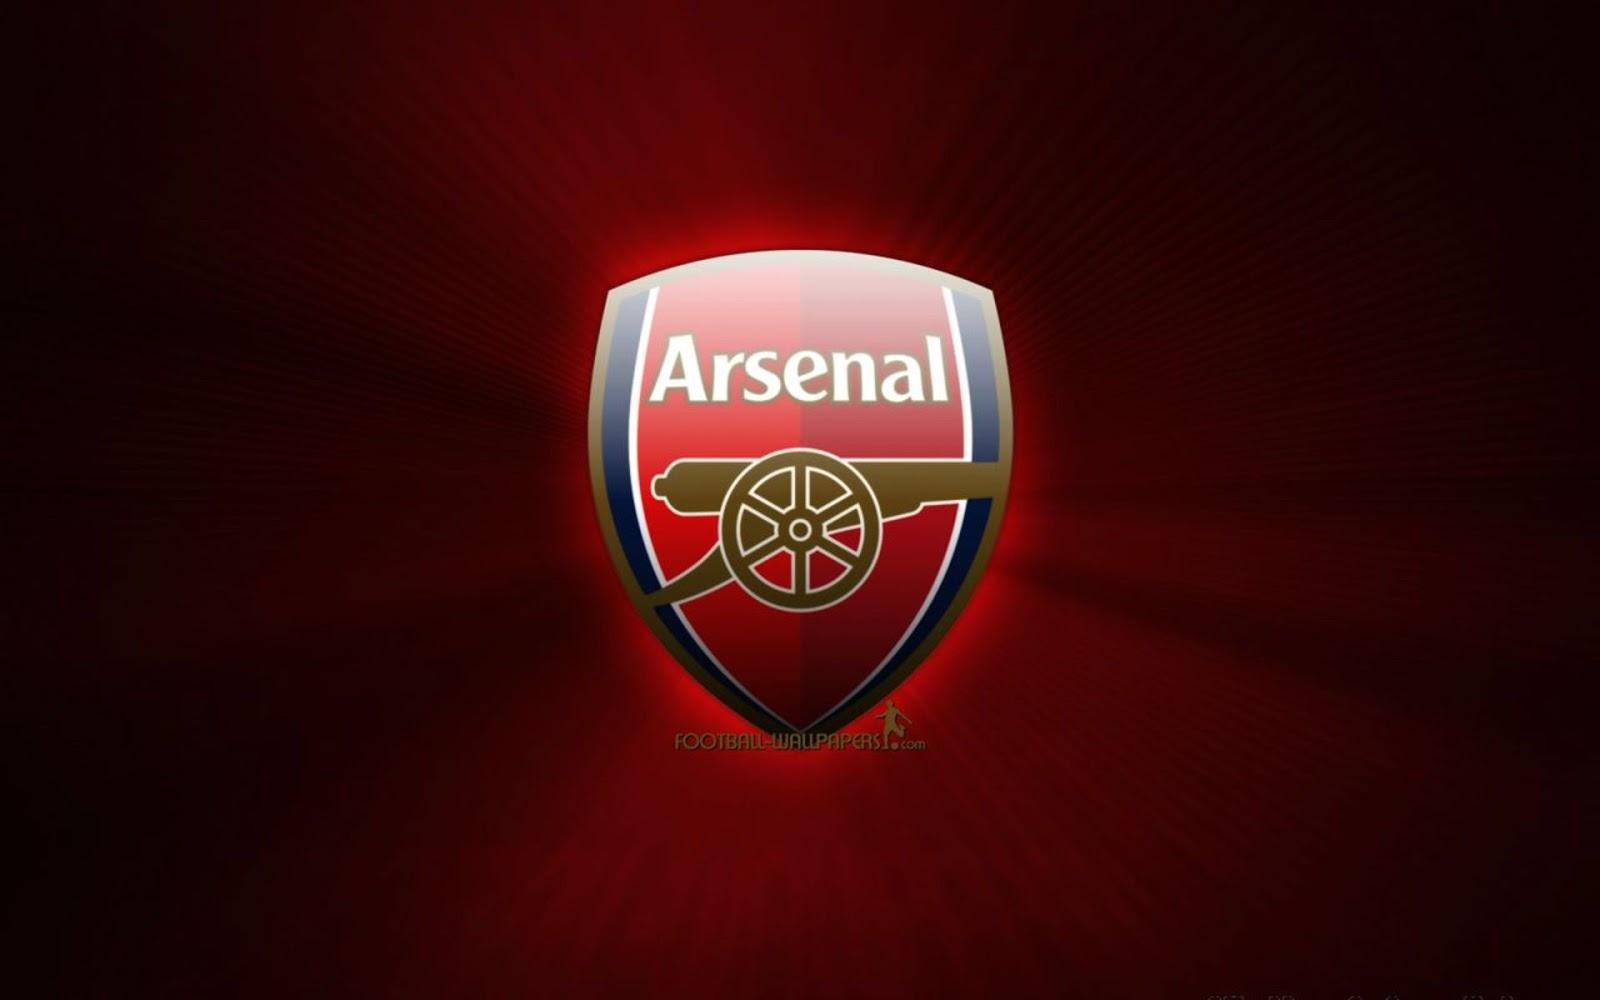 wallpapers hd for mac Arsenal Football Club Logo Wallpaper HD 1600x1000